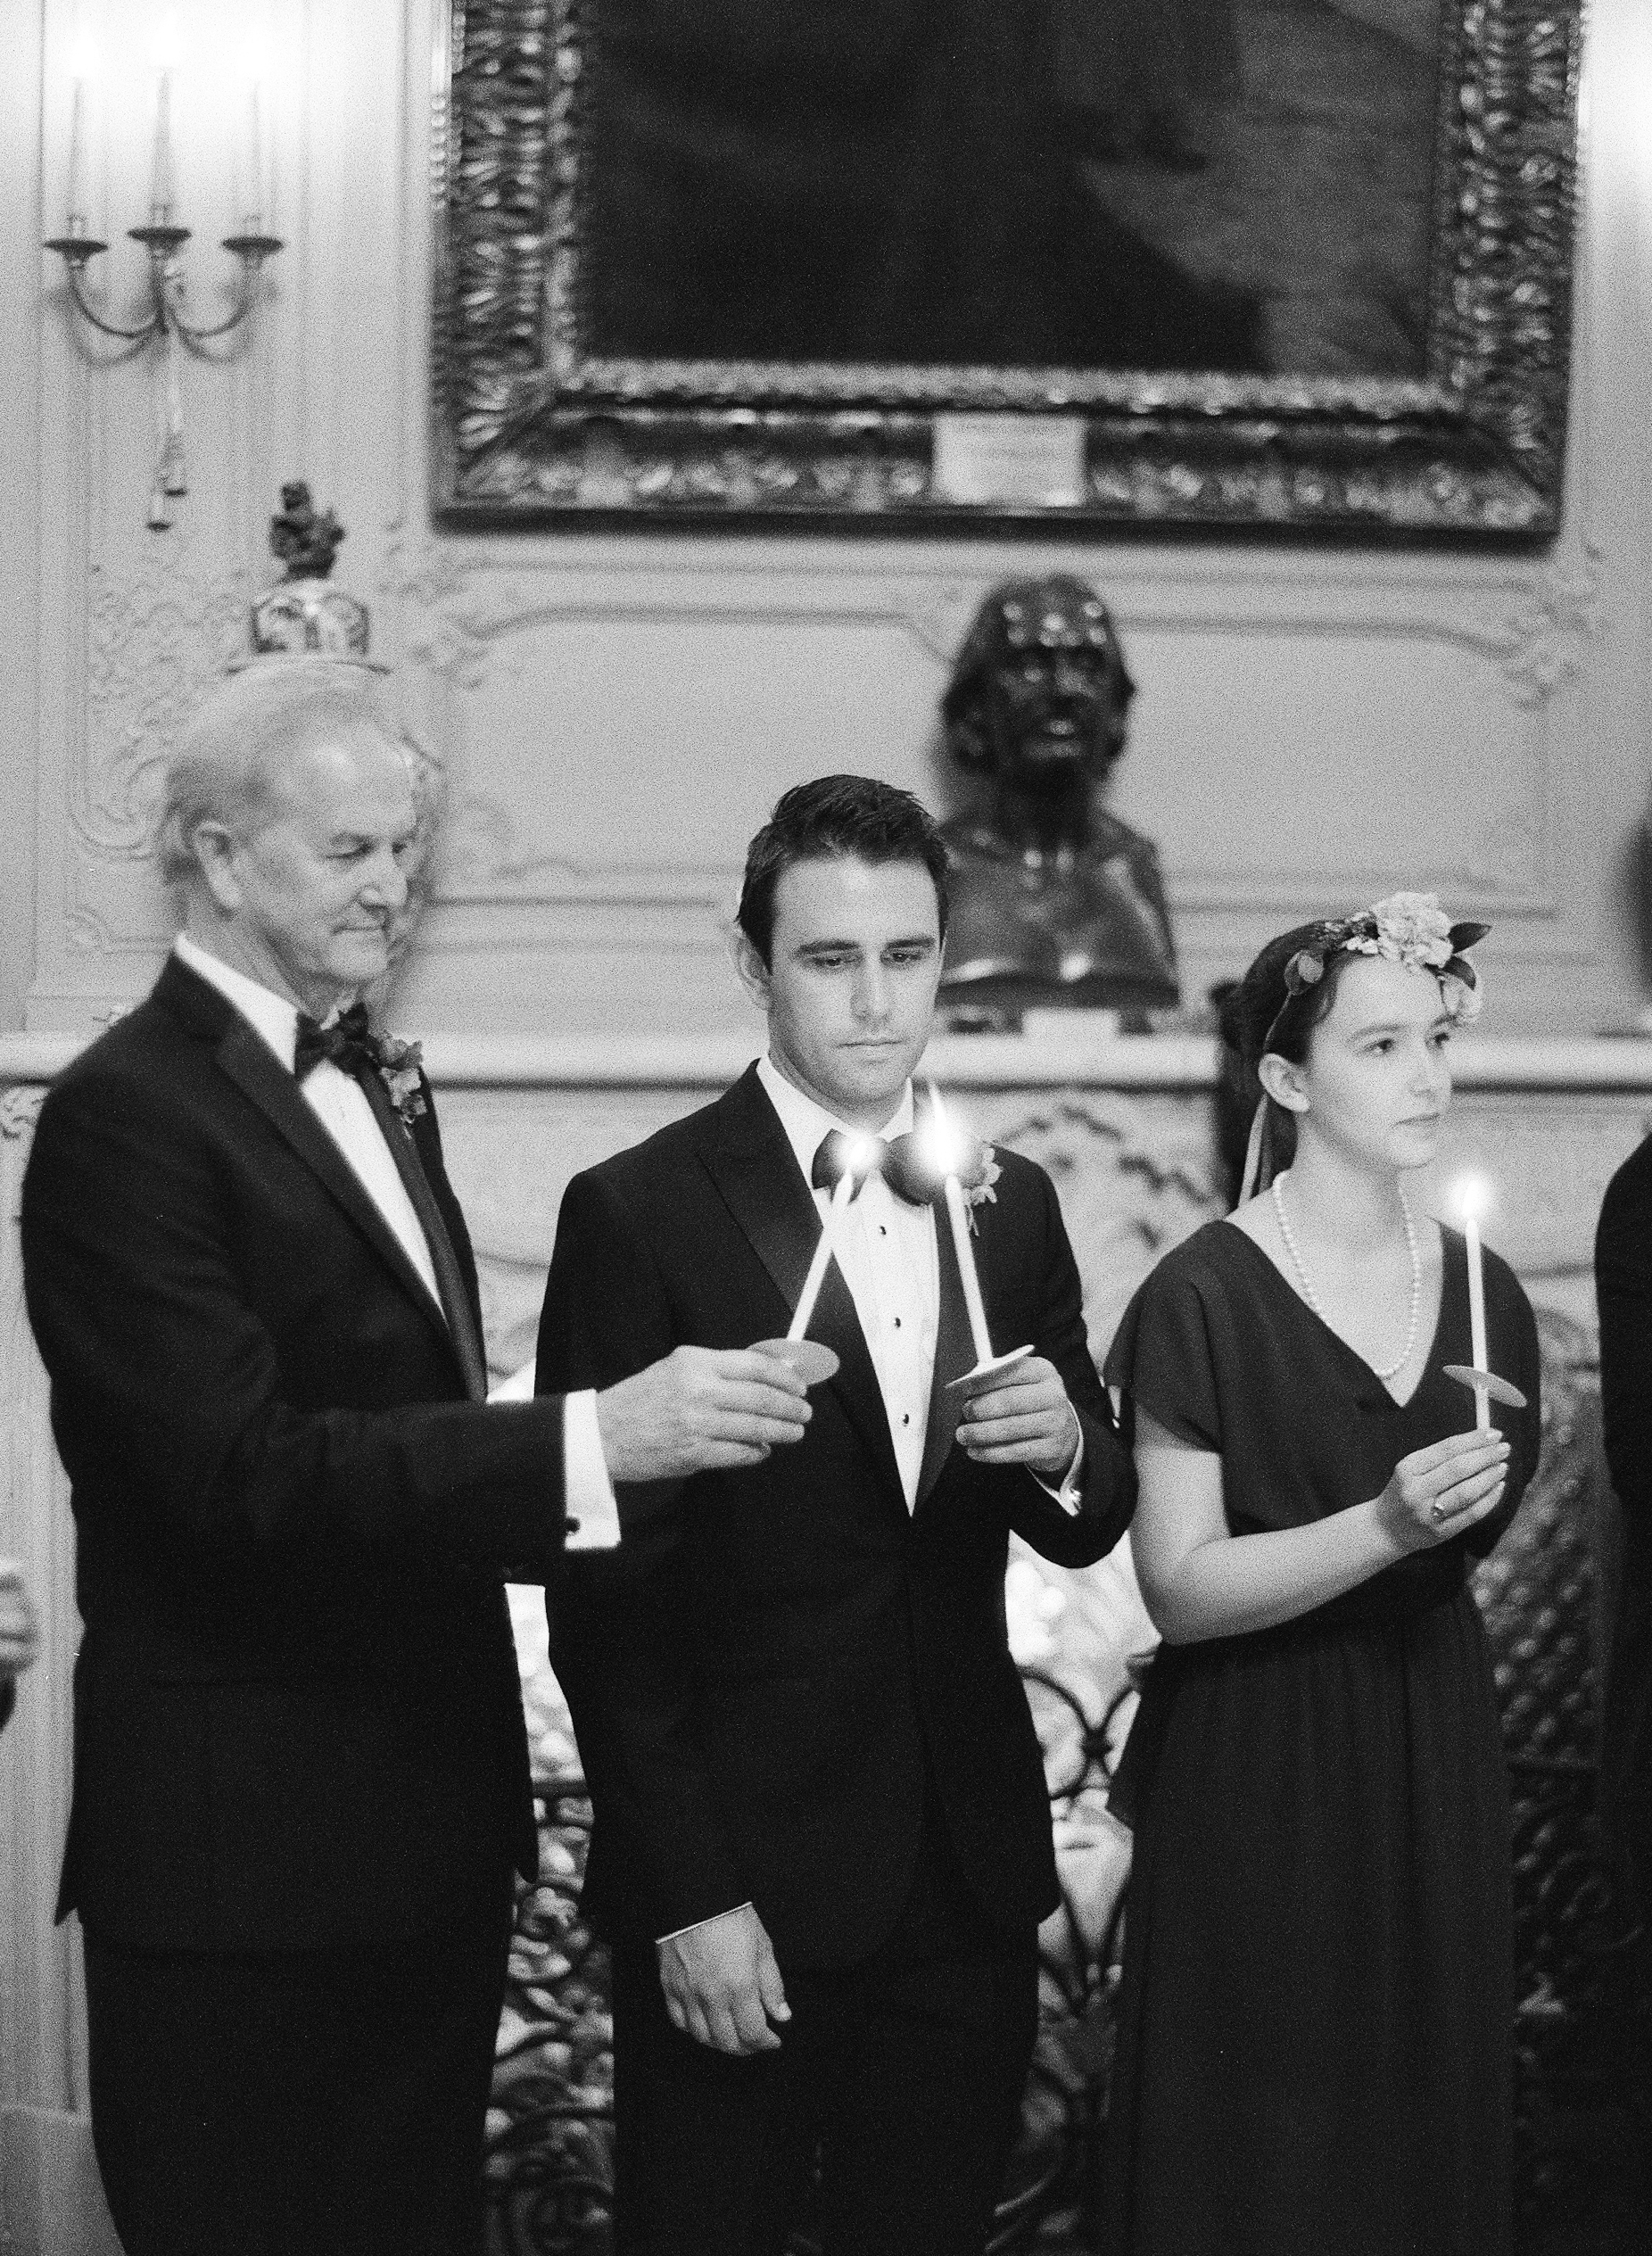 Ellen and Jeremy Wedding-Paris France-Carrie King Photographer-207.jpg